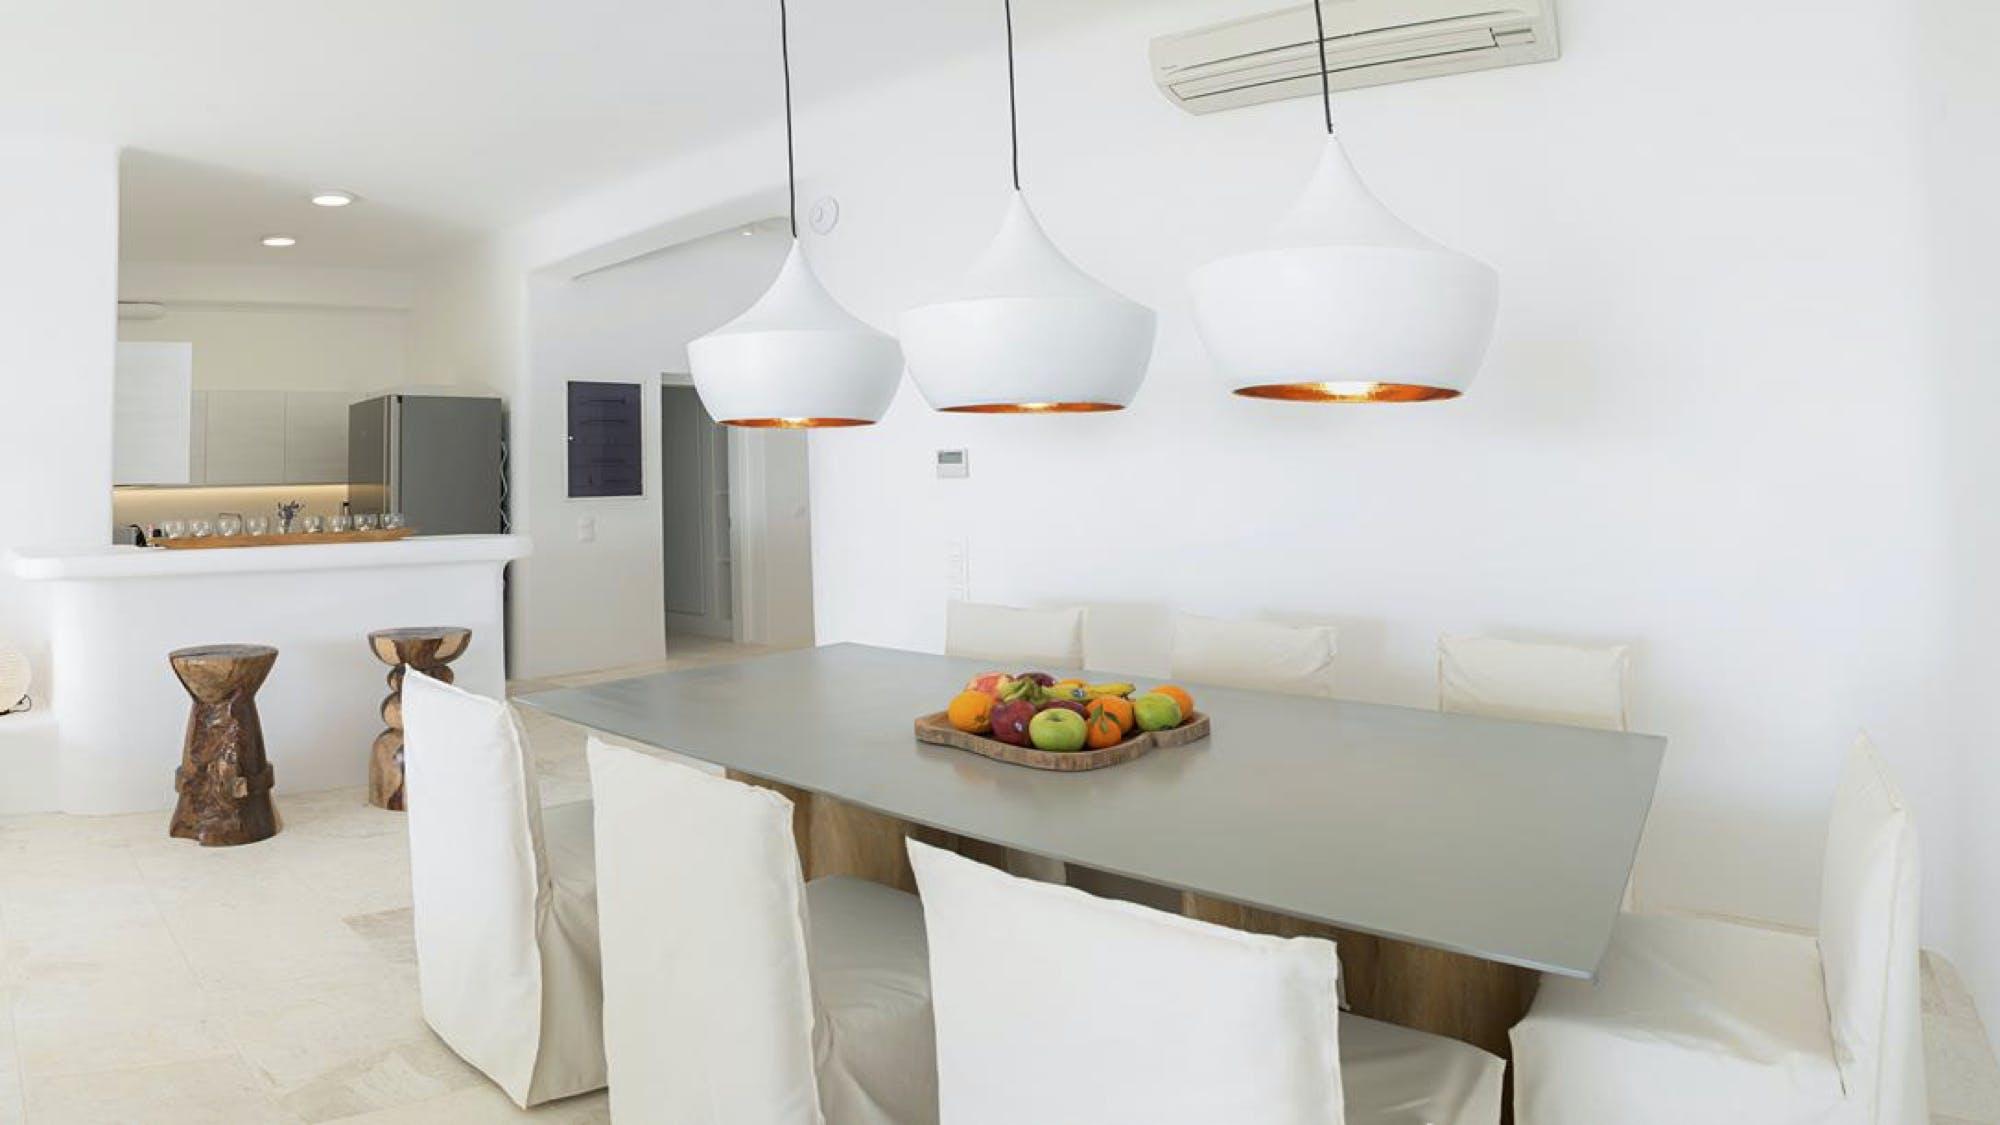 Villa ciel kitchen